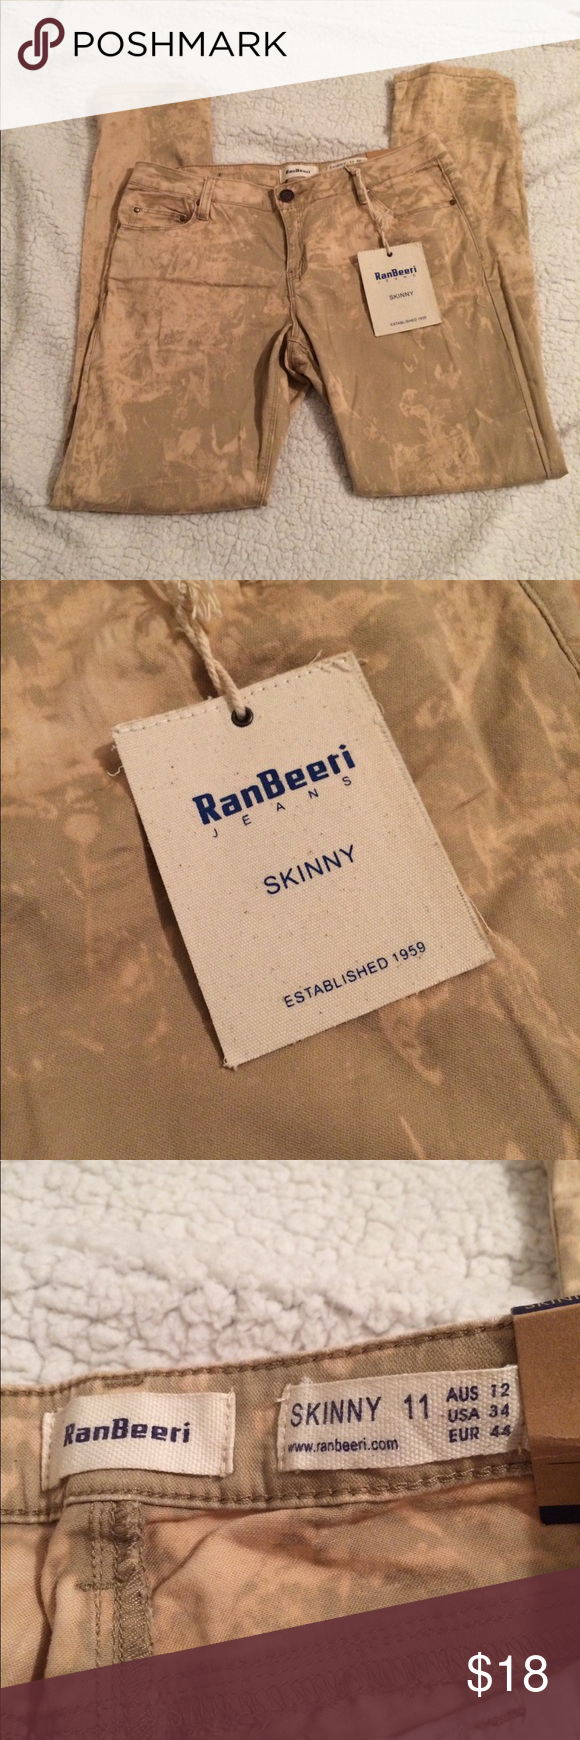 Ranbeeri skinny grunge style jean nvjuhfo Images